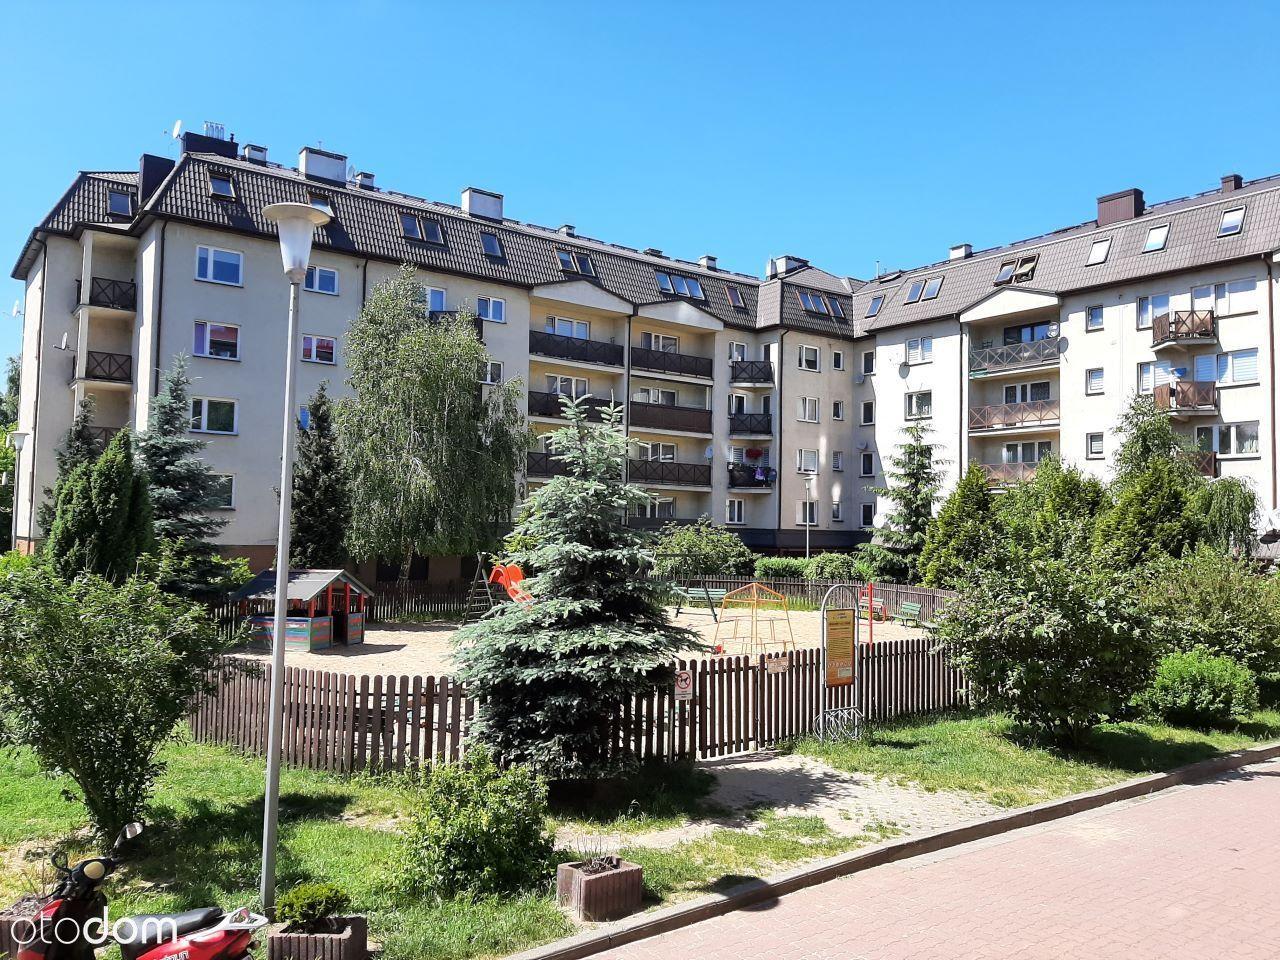 [TYLKO U NAS] Piękne mieszkanie w Mińsku Maz.